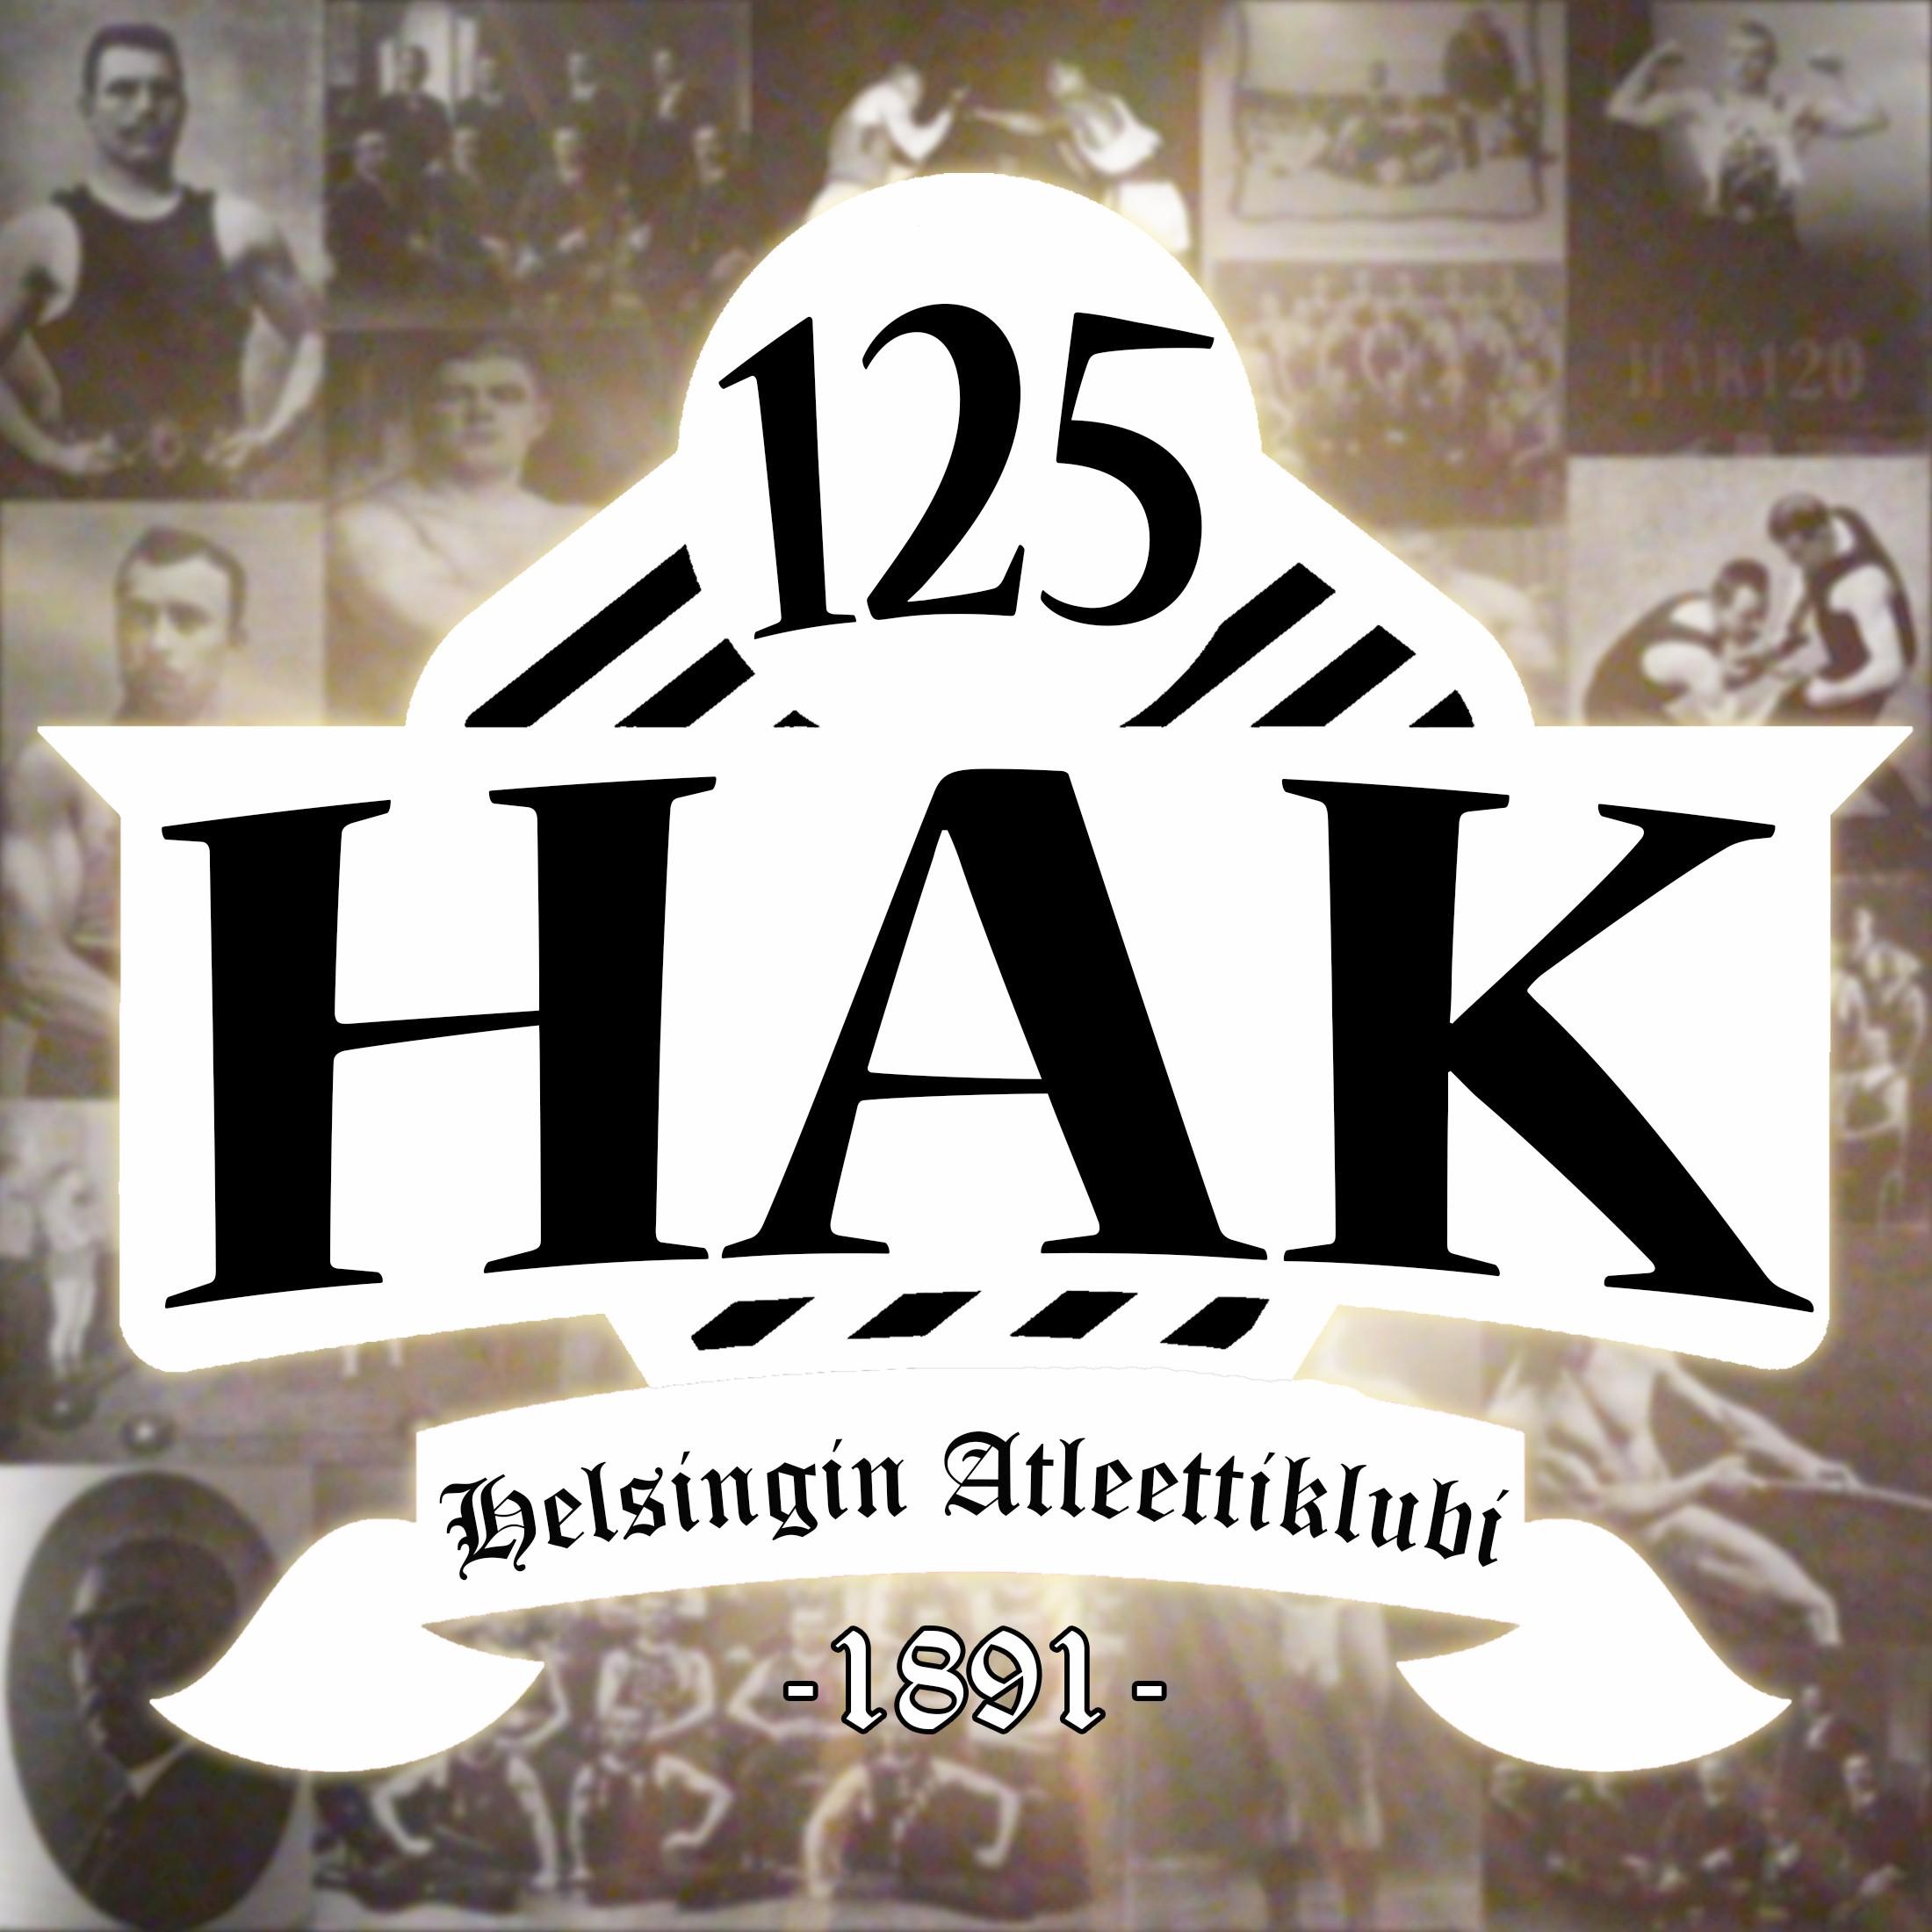 HAK_logo_125_1